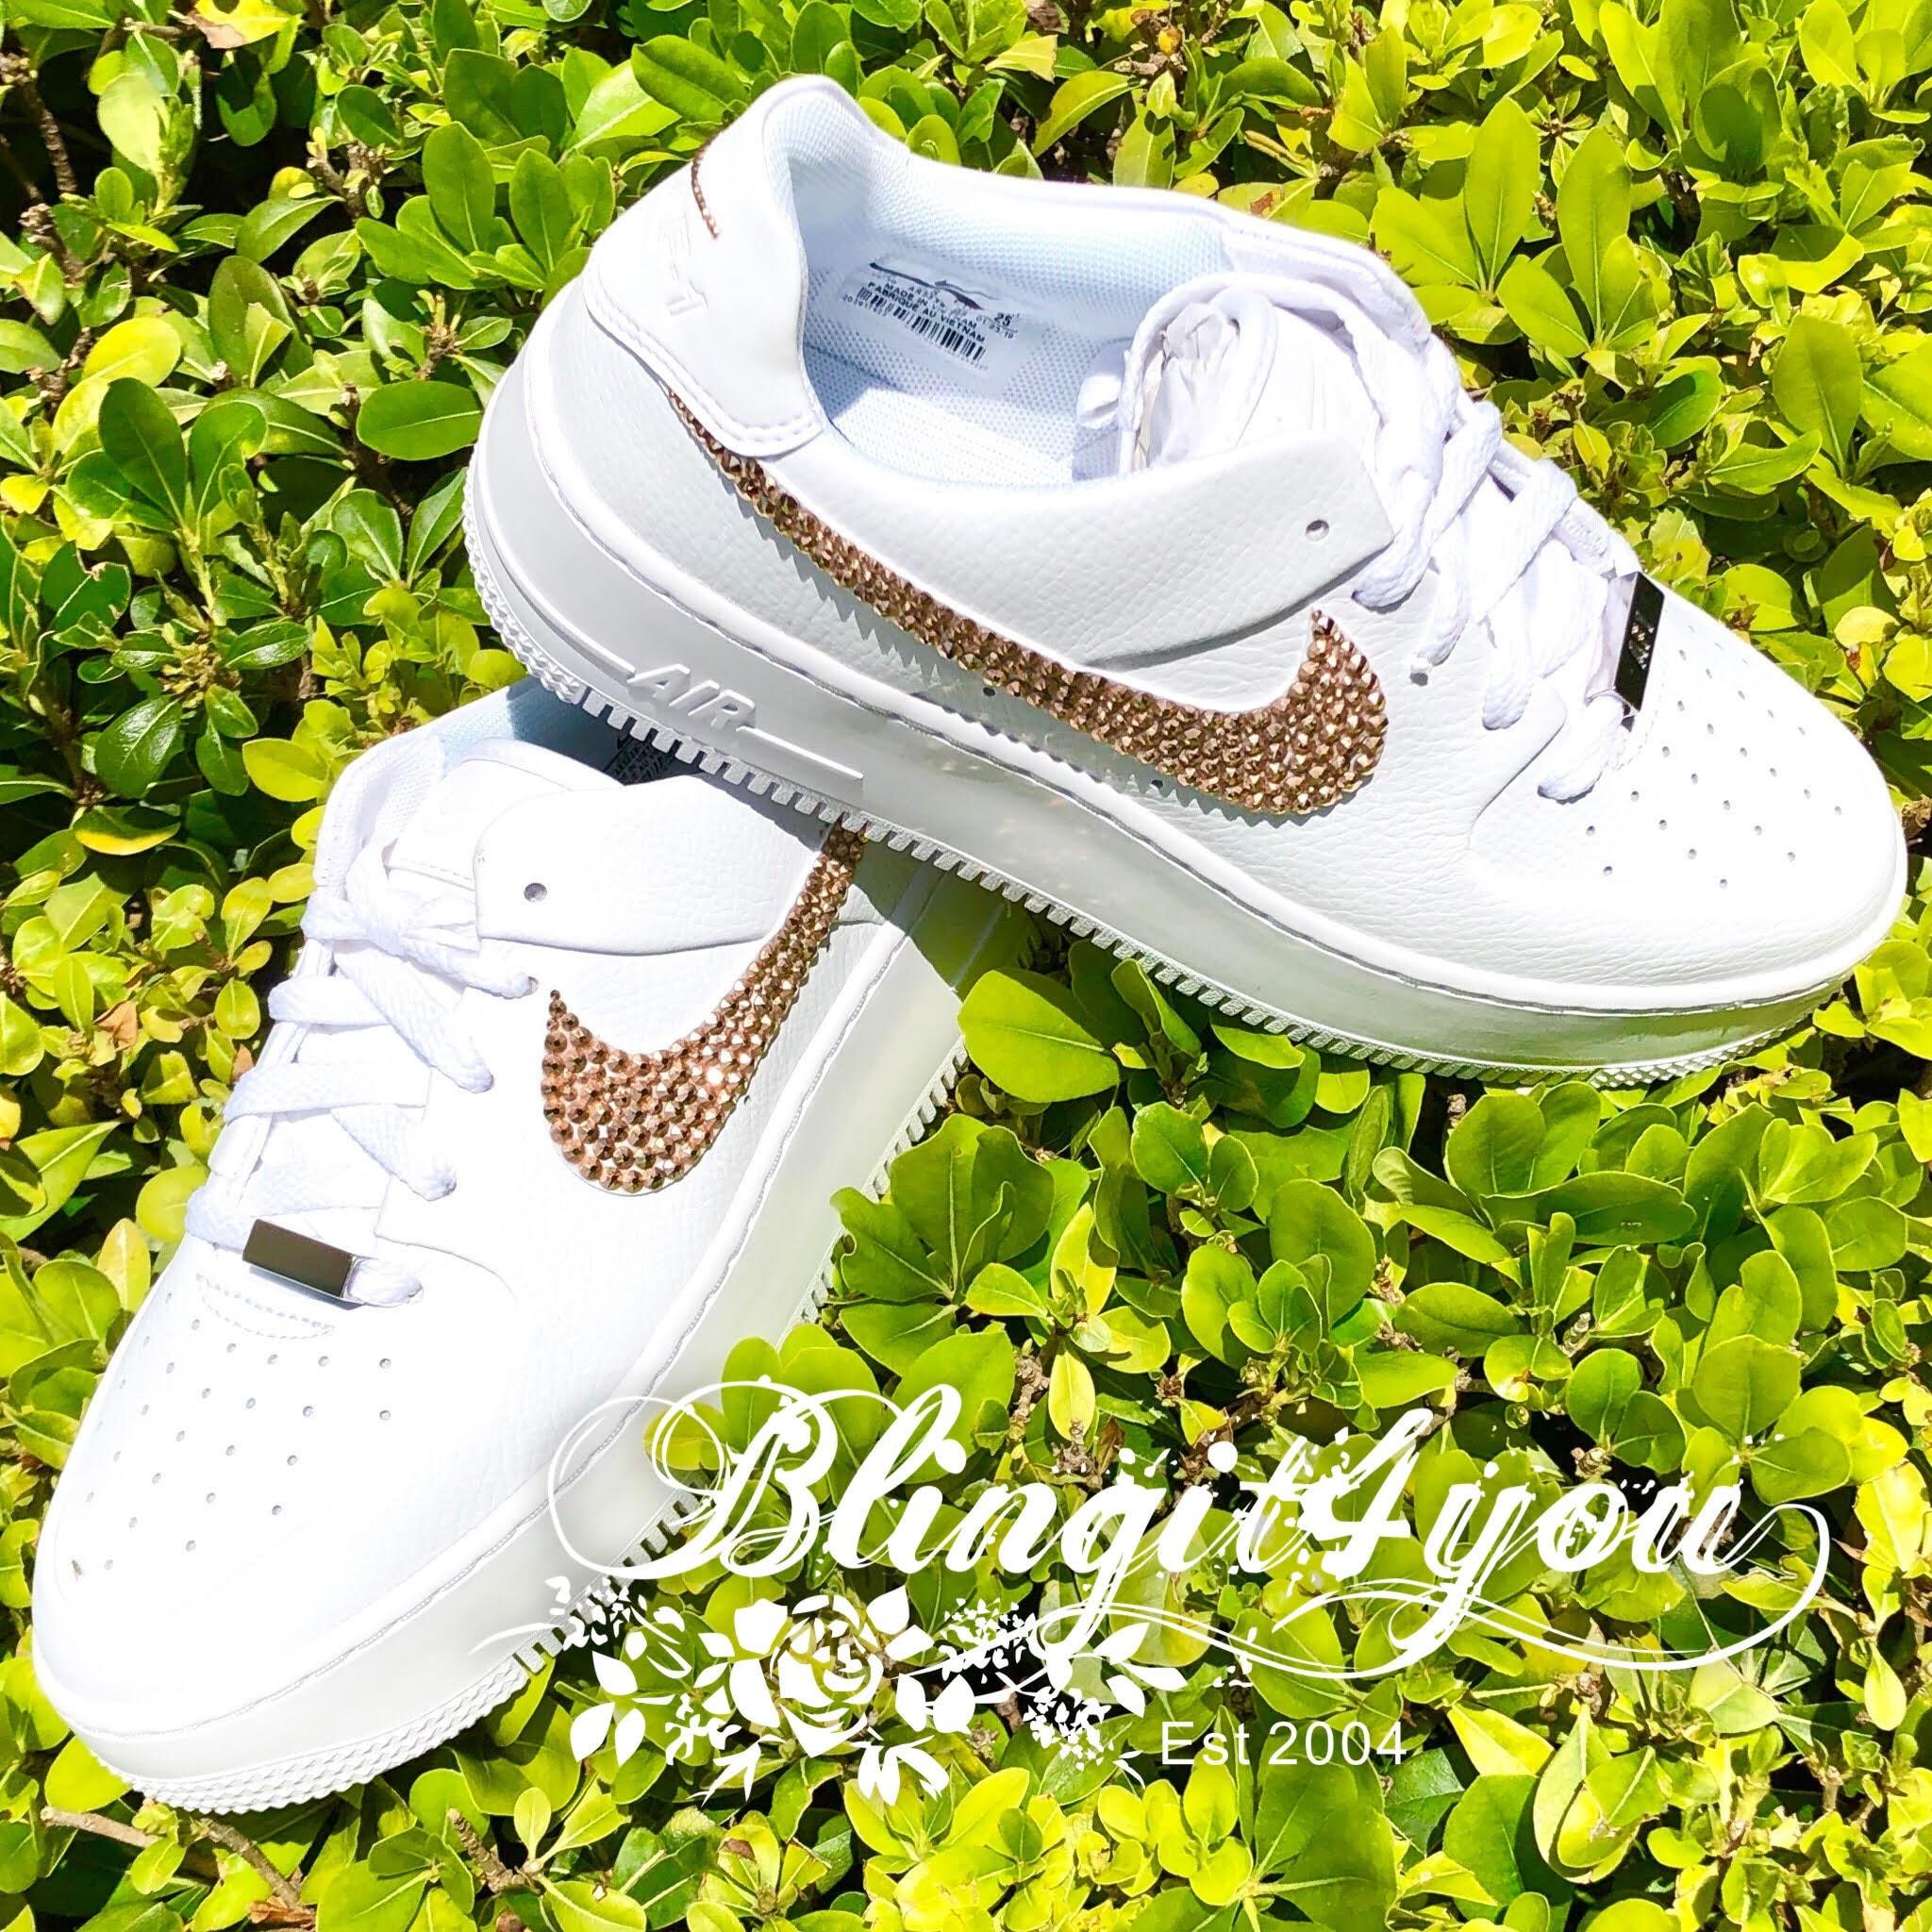 Rose Gold Swarovski Crystal Women Nike Air Force 1 Sage Low Shoes Bedazzled Nike Rhinestone Bling Nike AF1 Bling Wedding Dancing Shoes